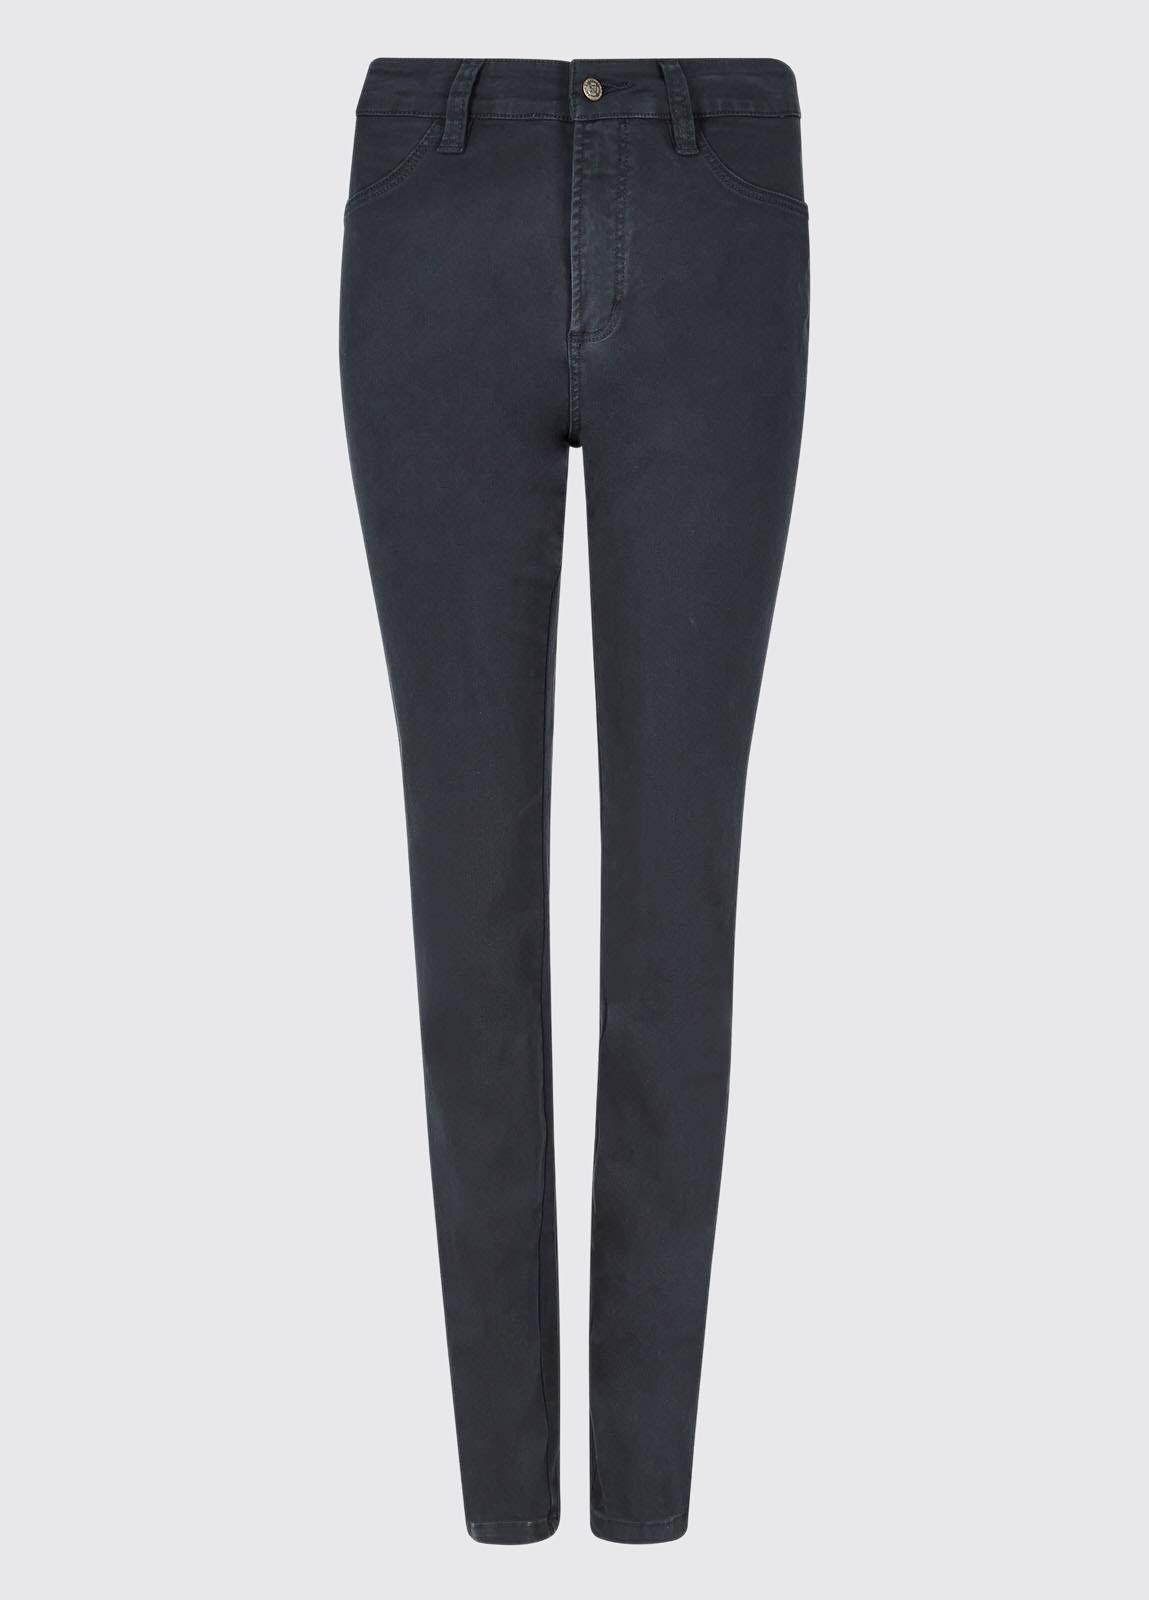 Hollyfern Jeans - Navy